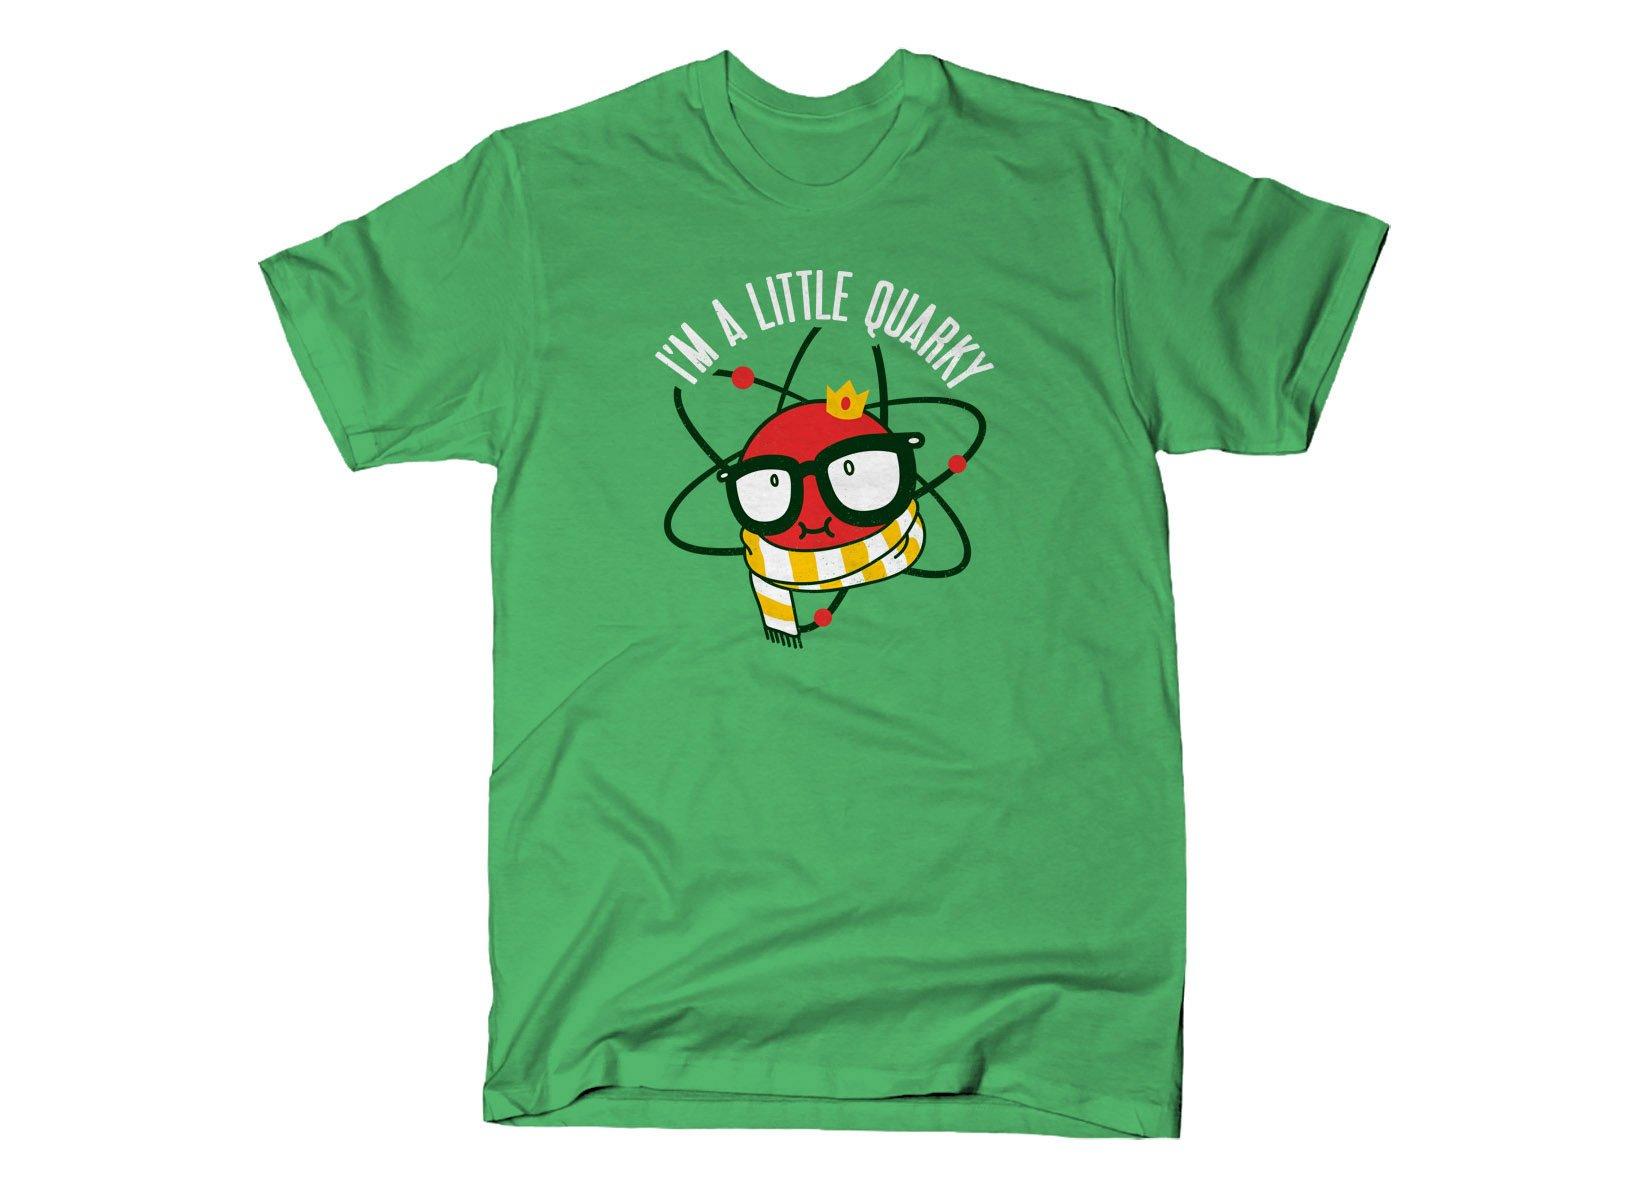 I'm A Little Quarky on Mens T-Shirt